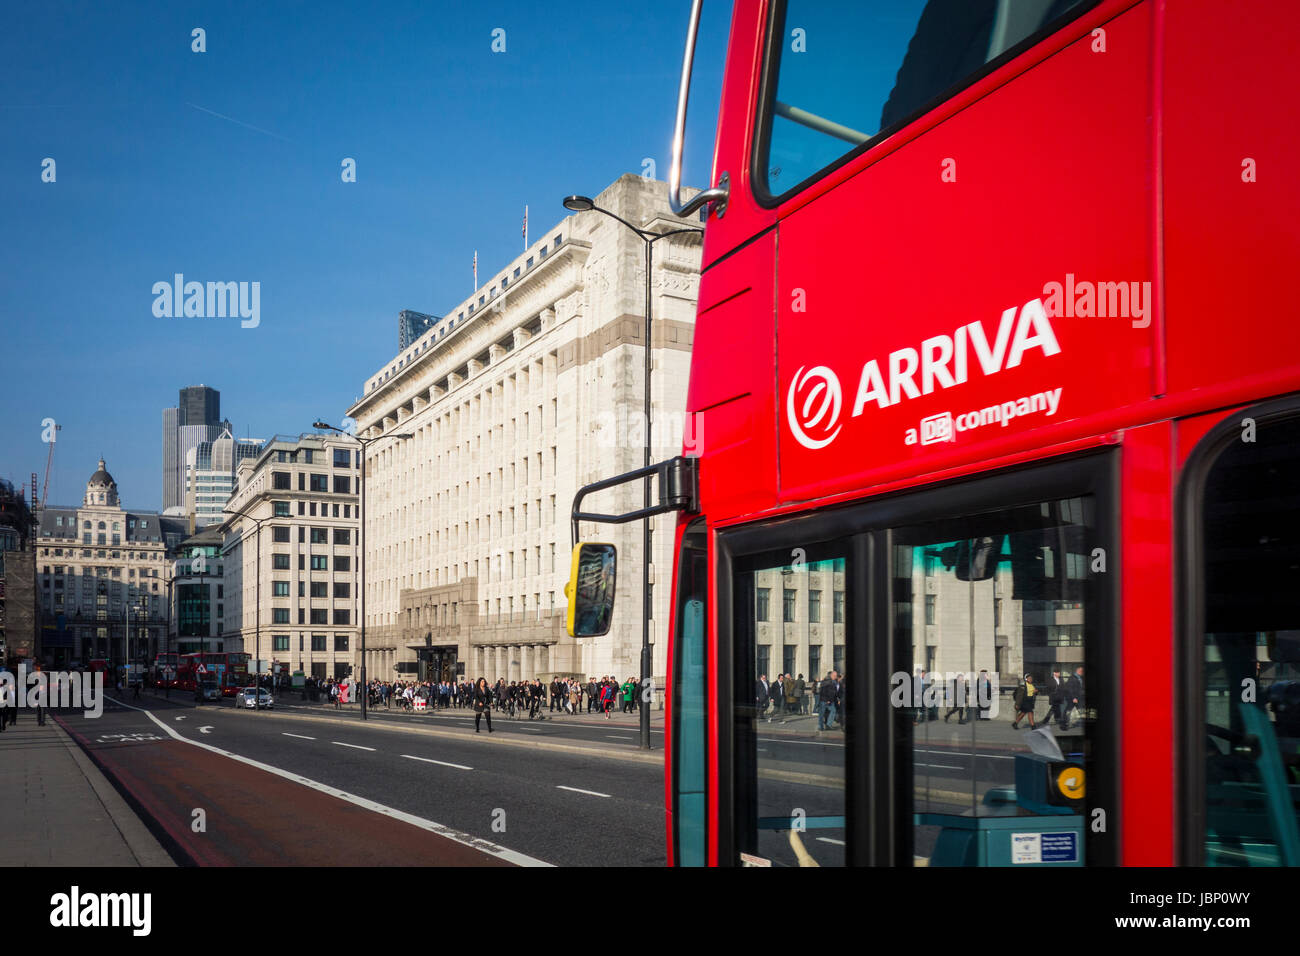 Arriva red London bus travelling over London Bridge, UK - Stock Image